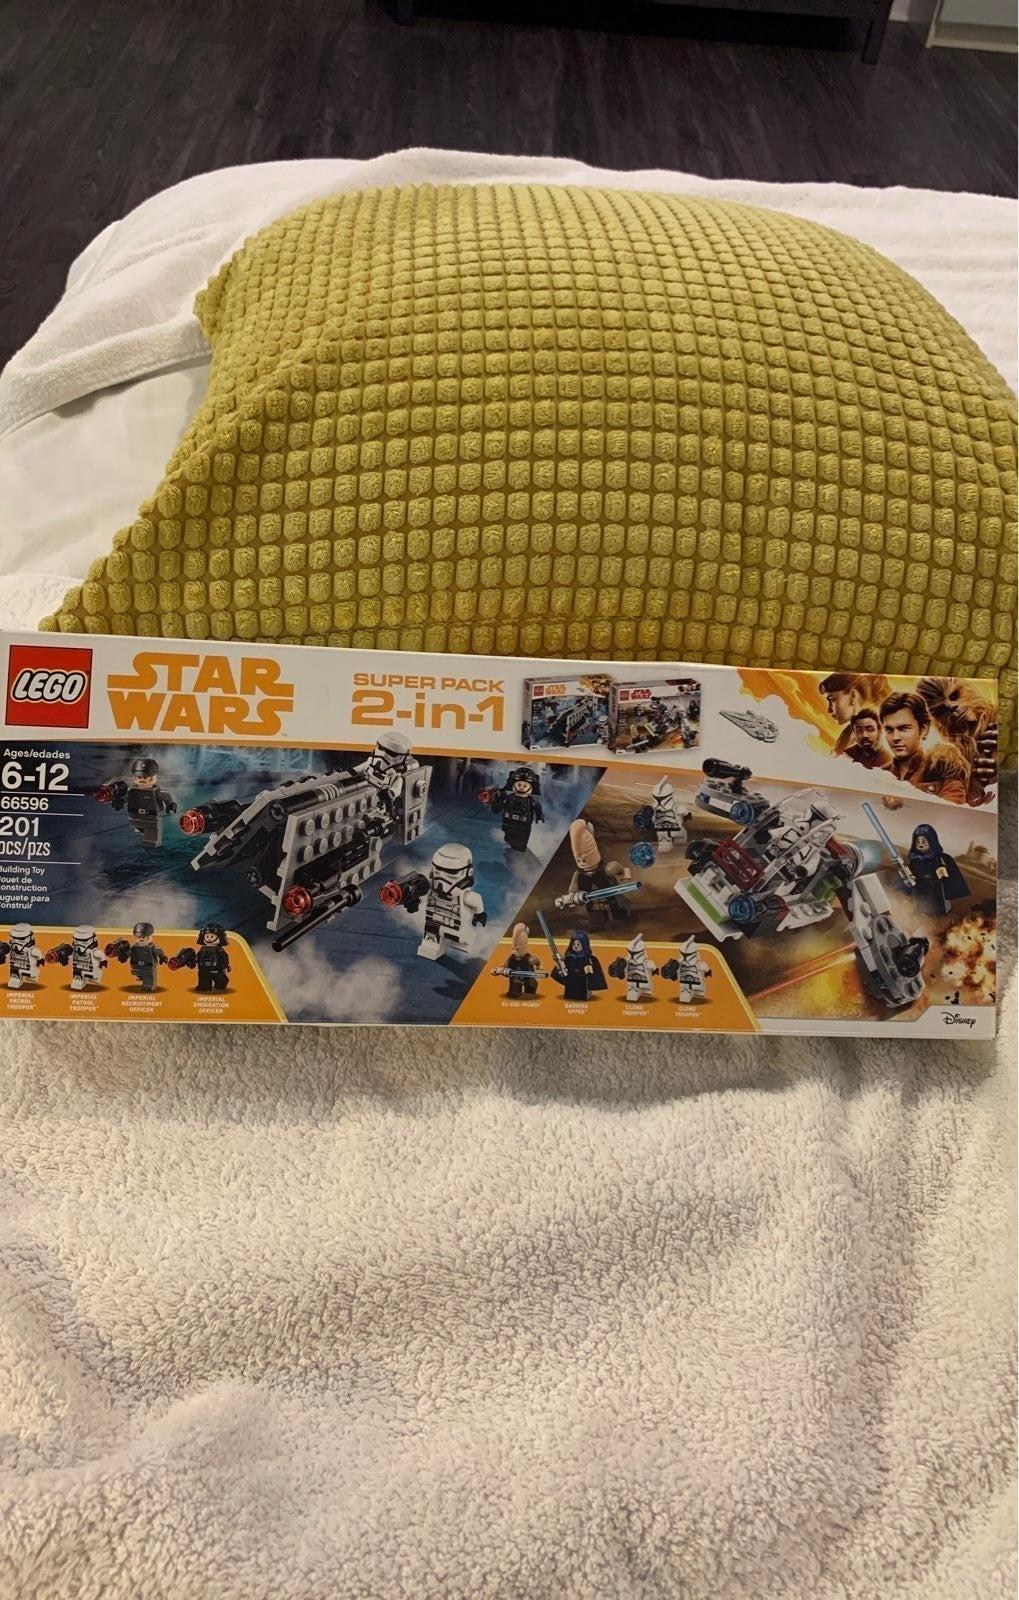 LEGO Star Wars Super Pack 2 in 1 66596